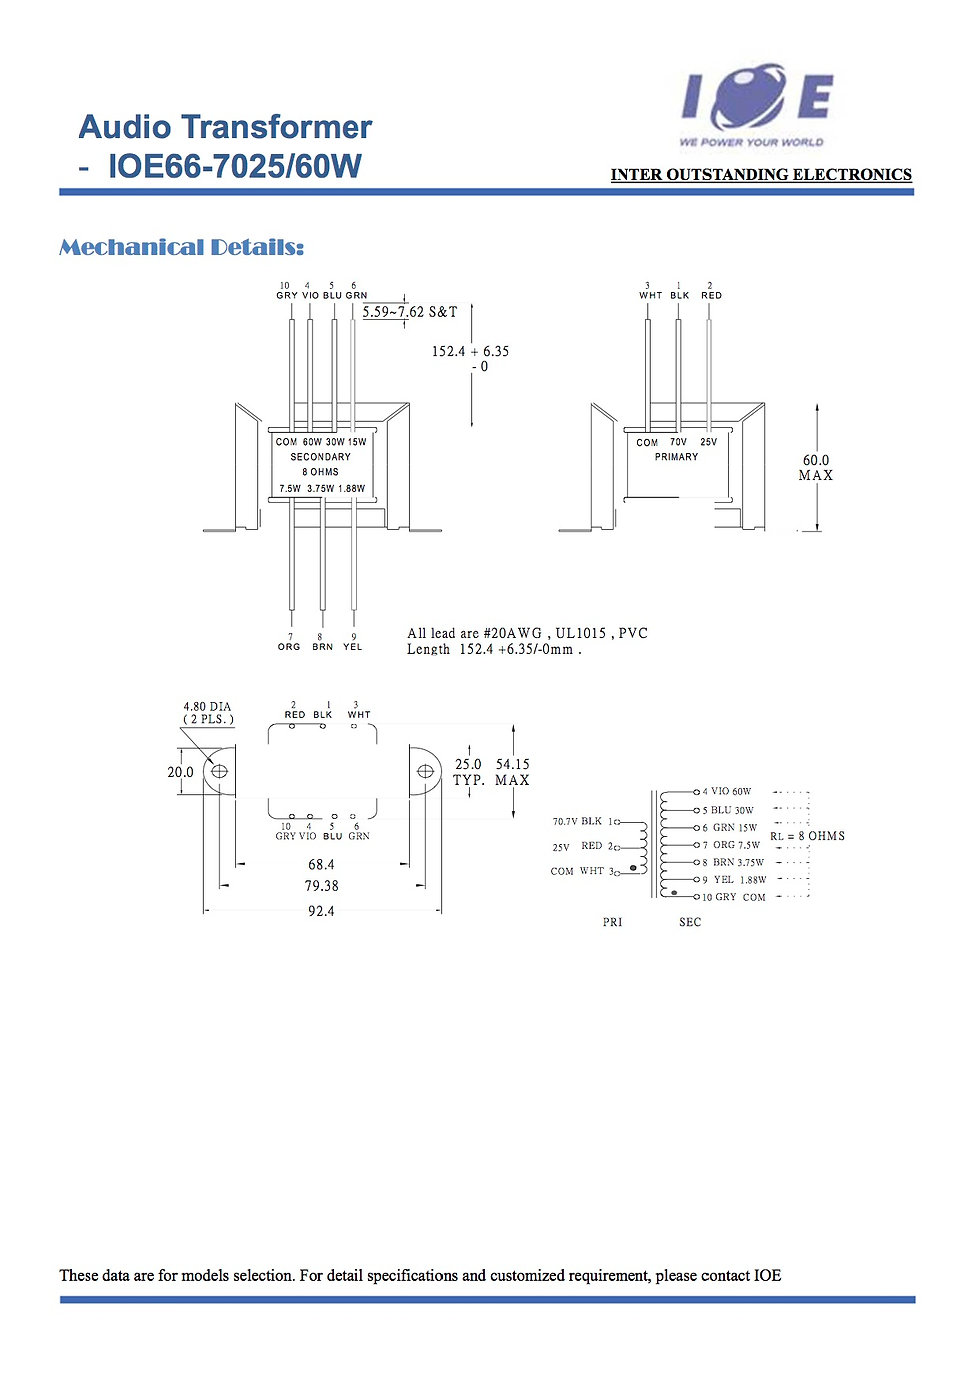 Audio Transformer_IOE66-7025-60W_3.jpg